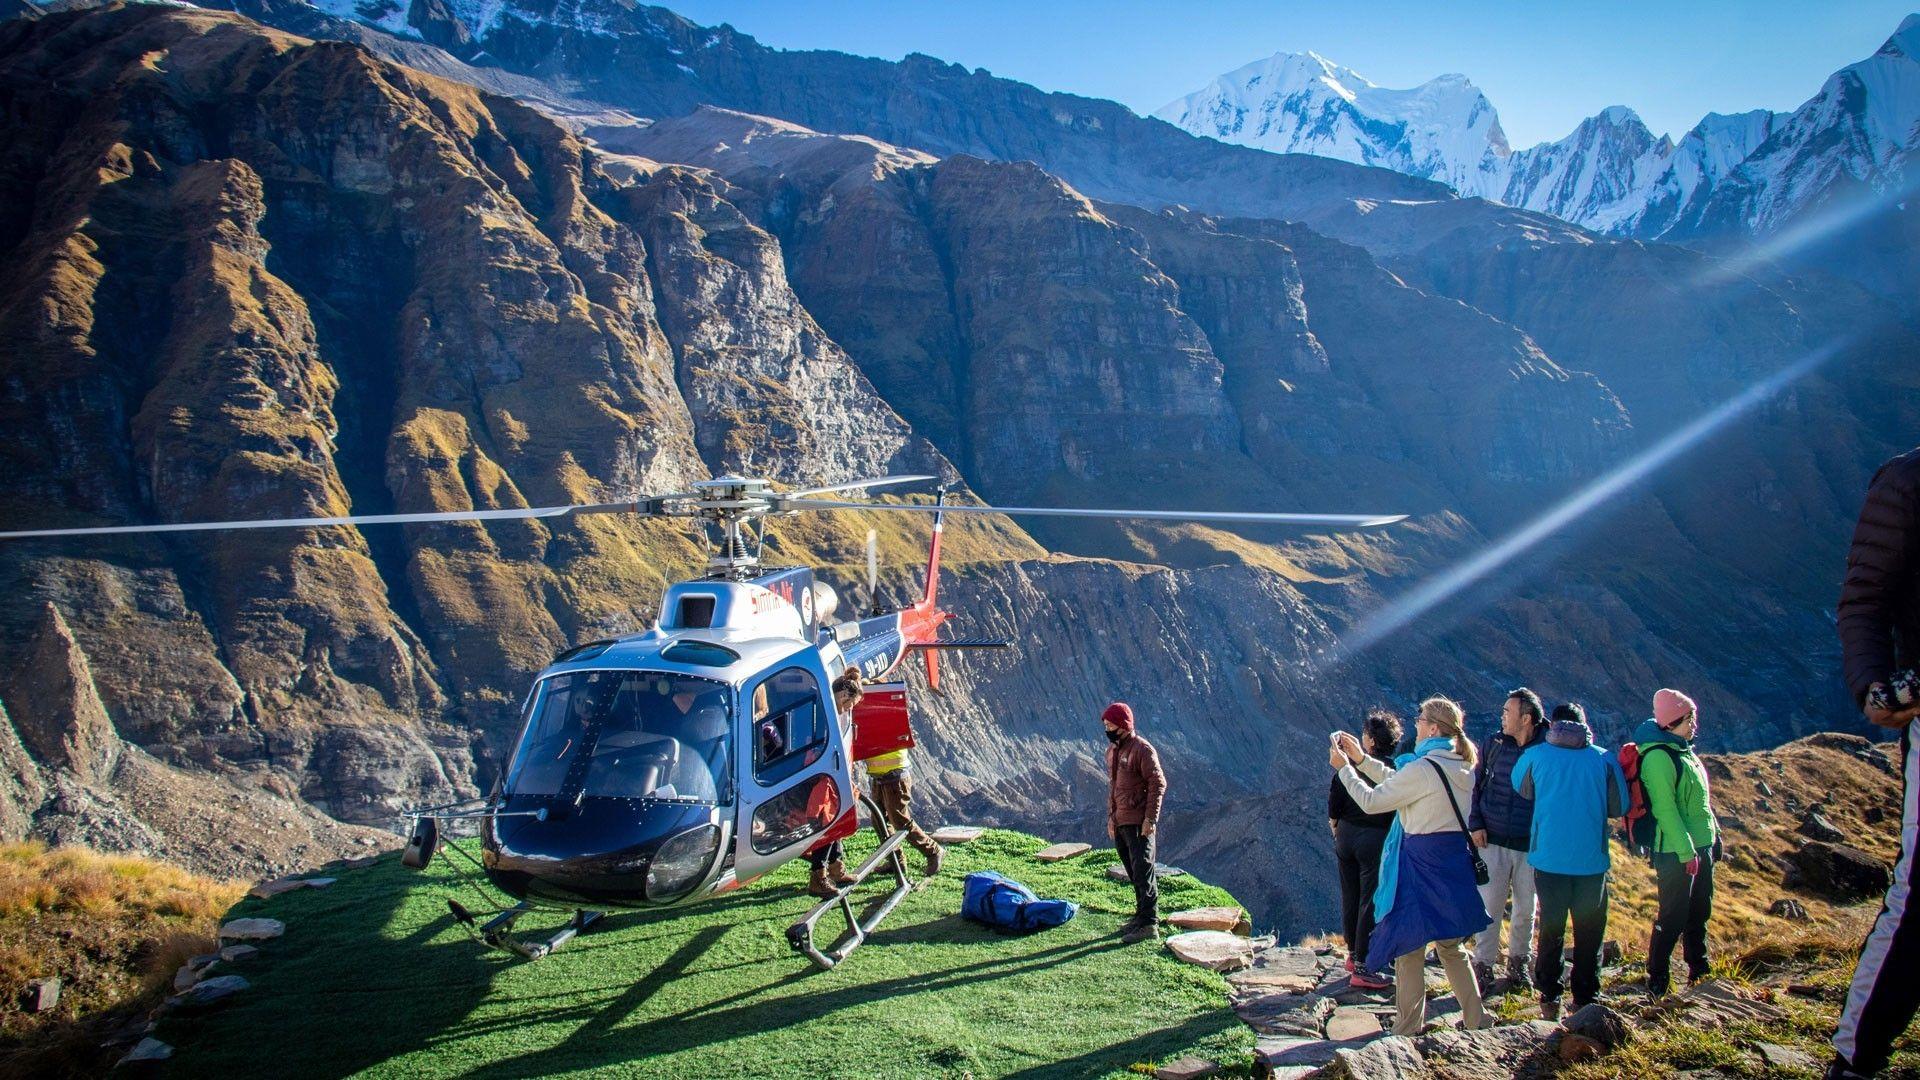 Heli tour to Annapurna base camp